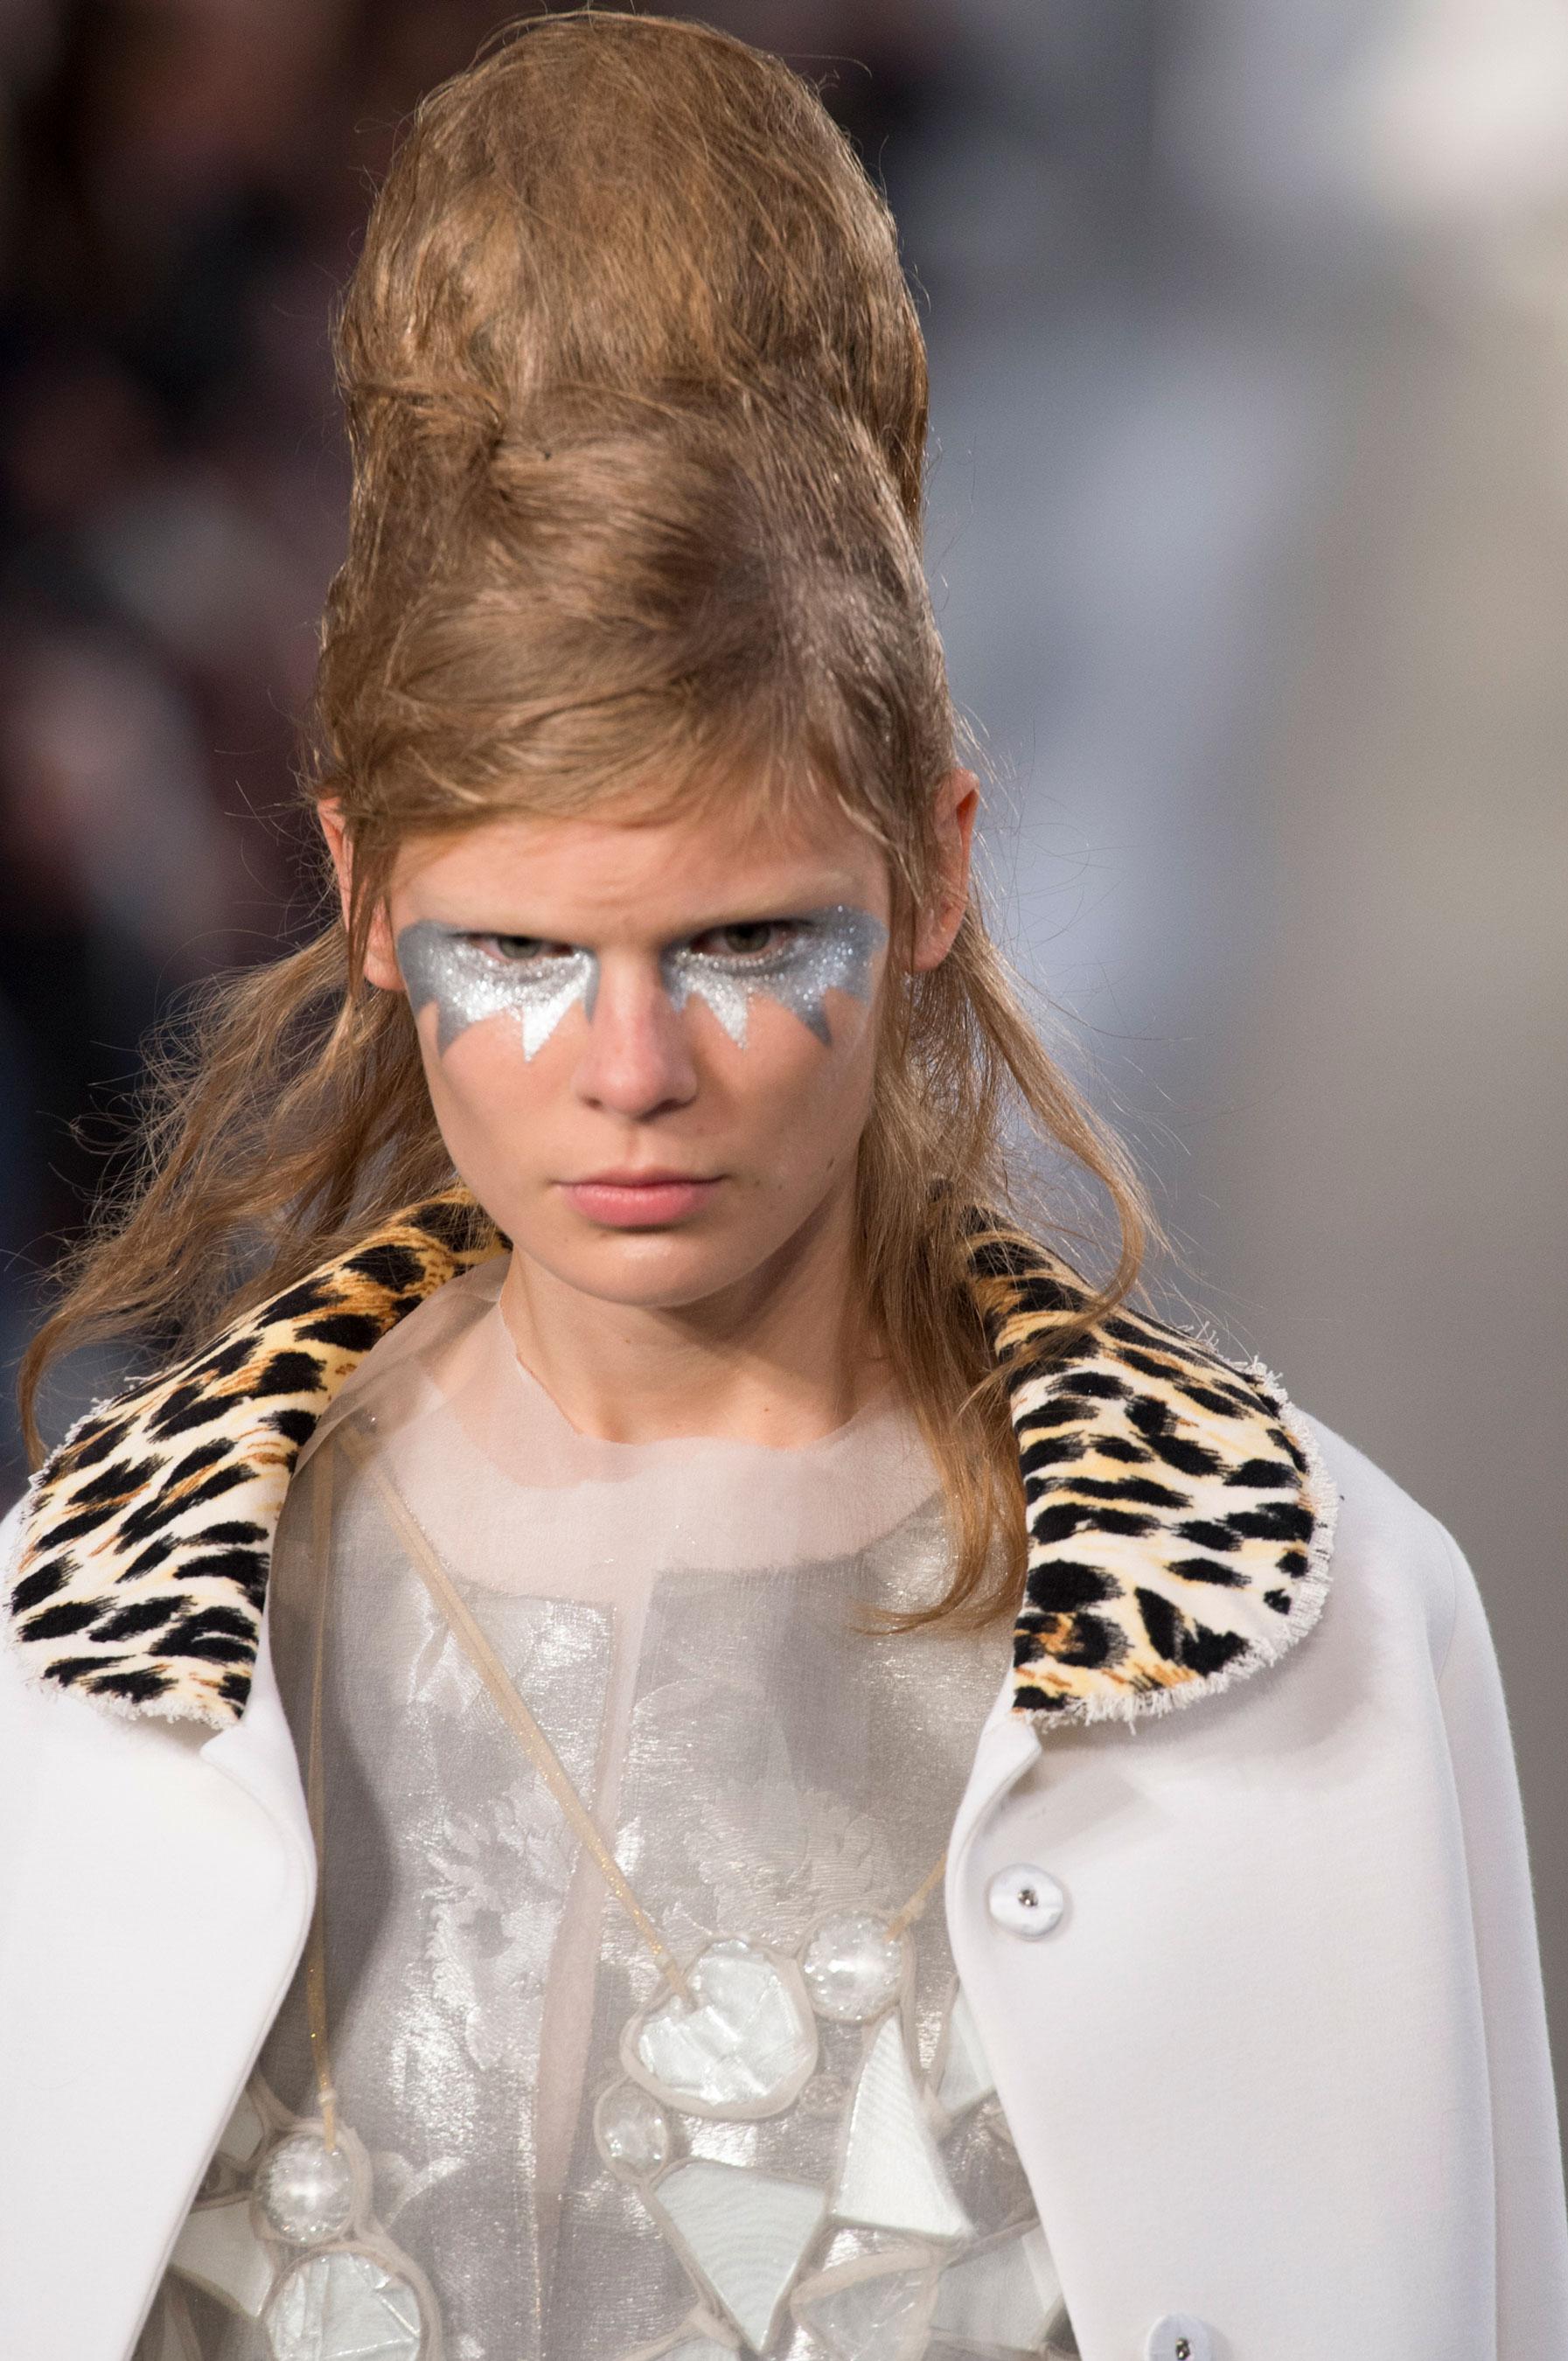 Maison-Margiela-spring-2016-runway-beauty-fashion-show-the-impression-039